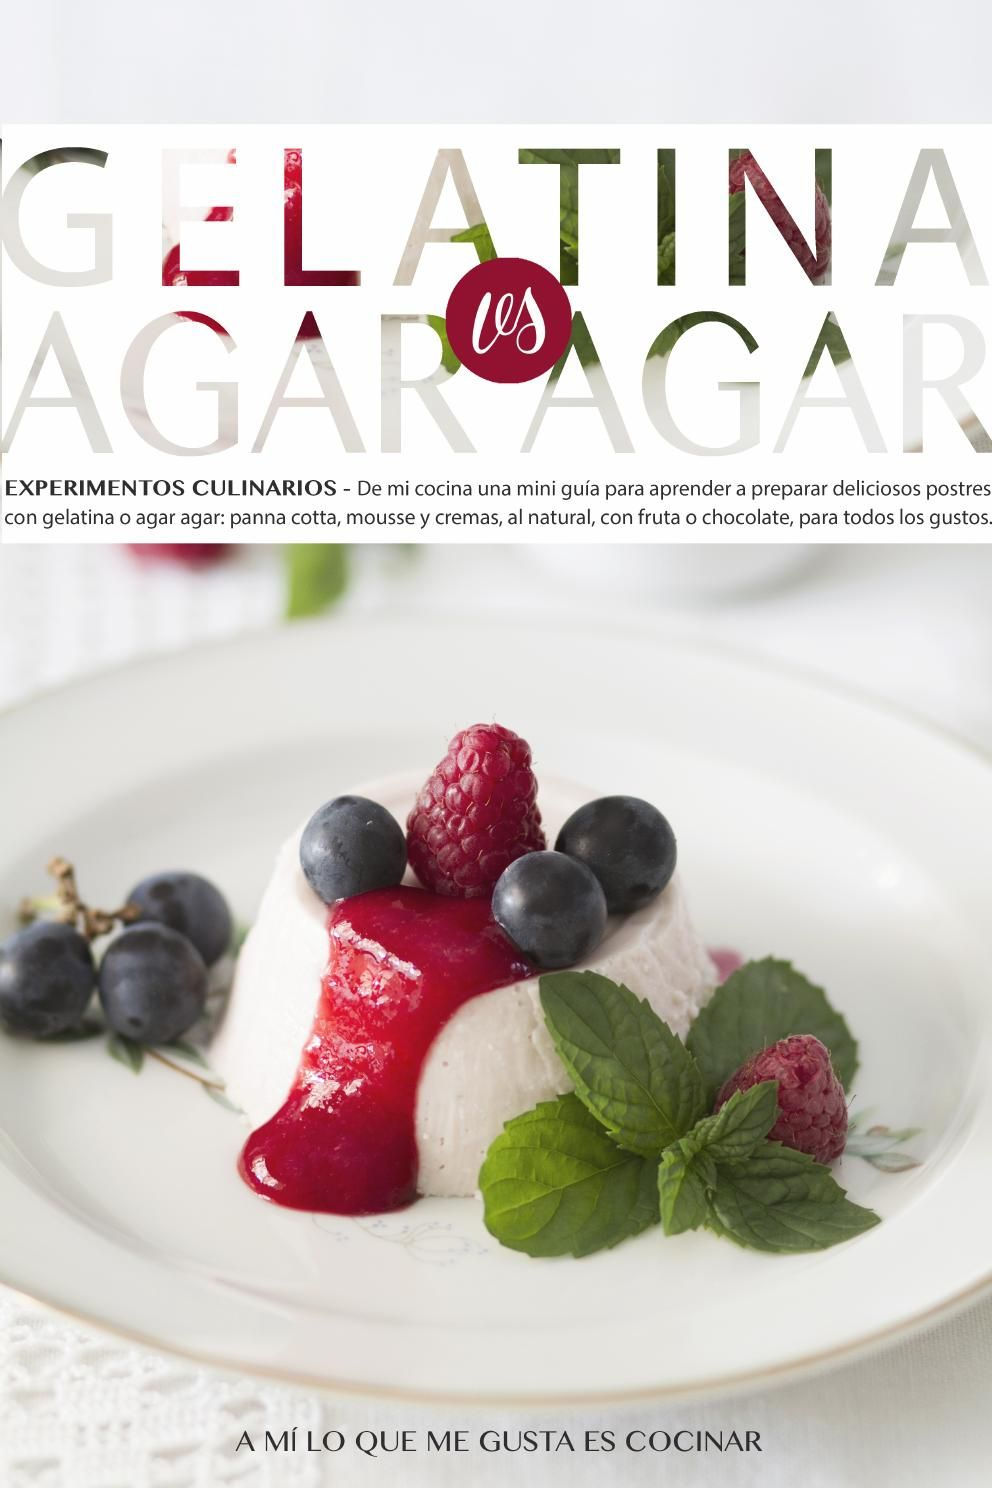 Gelatina Vs Agar agar Libro de recetas sobre gelatina y agar agar de http://amiloquemegustaescocinar.com